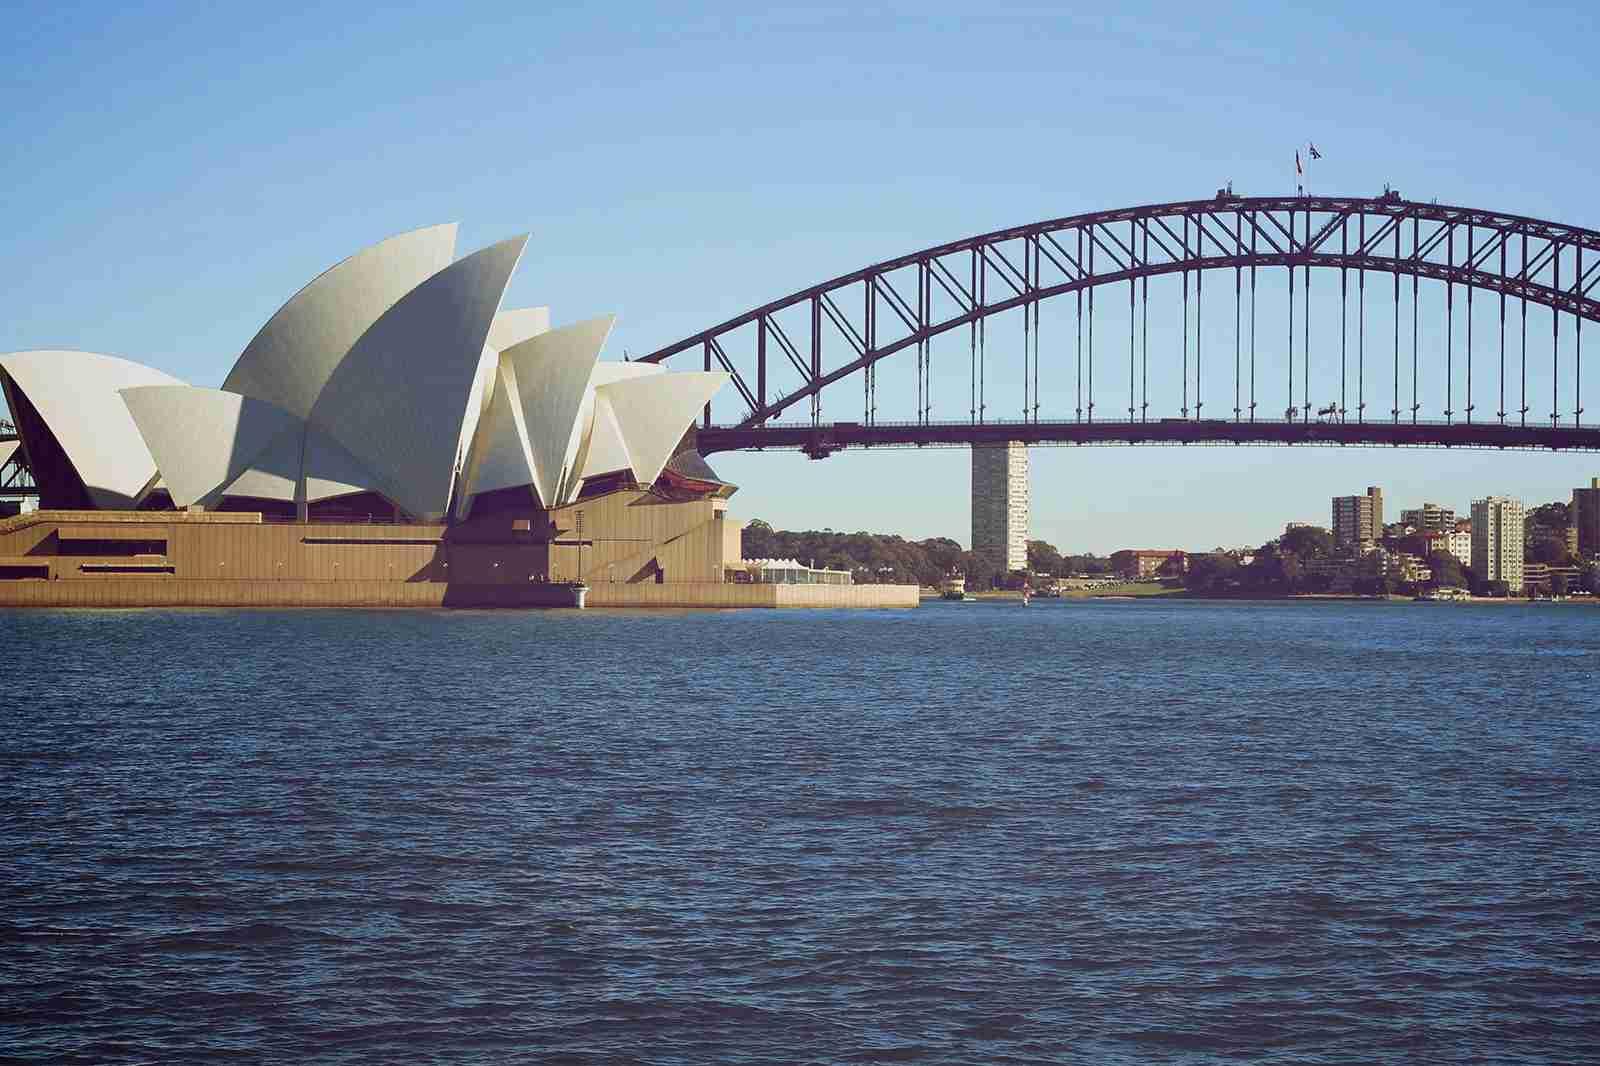 Sydney Harbor bridge and the Sydney Opera House. (Photo by Wyatt Smith/The Points Guy)